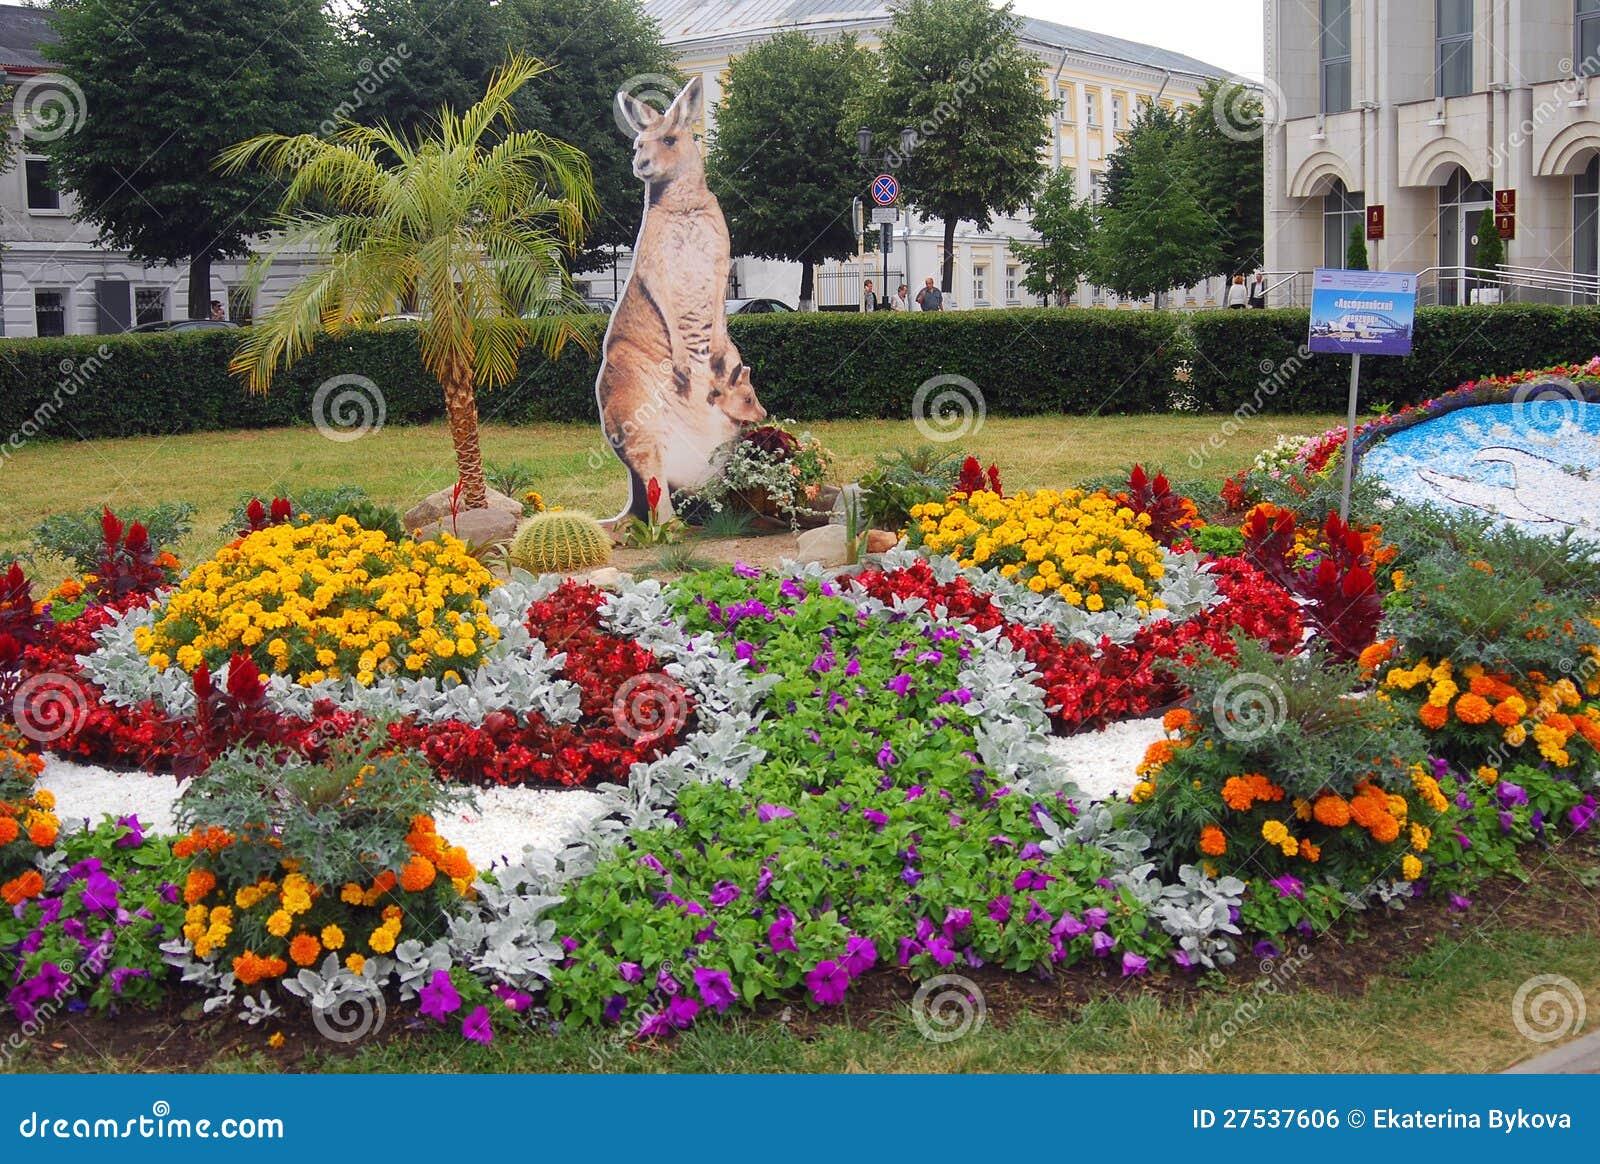 Many Beautiful Flowers And Kangaroo Model Editorial Photo Image Of